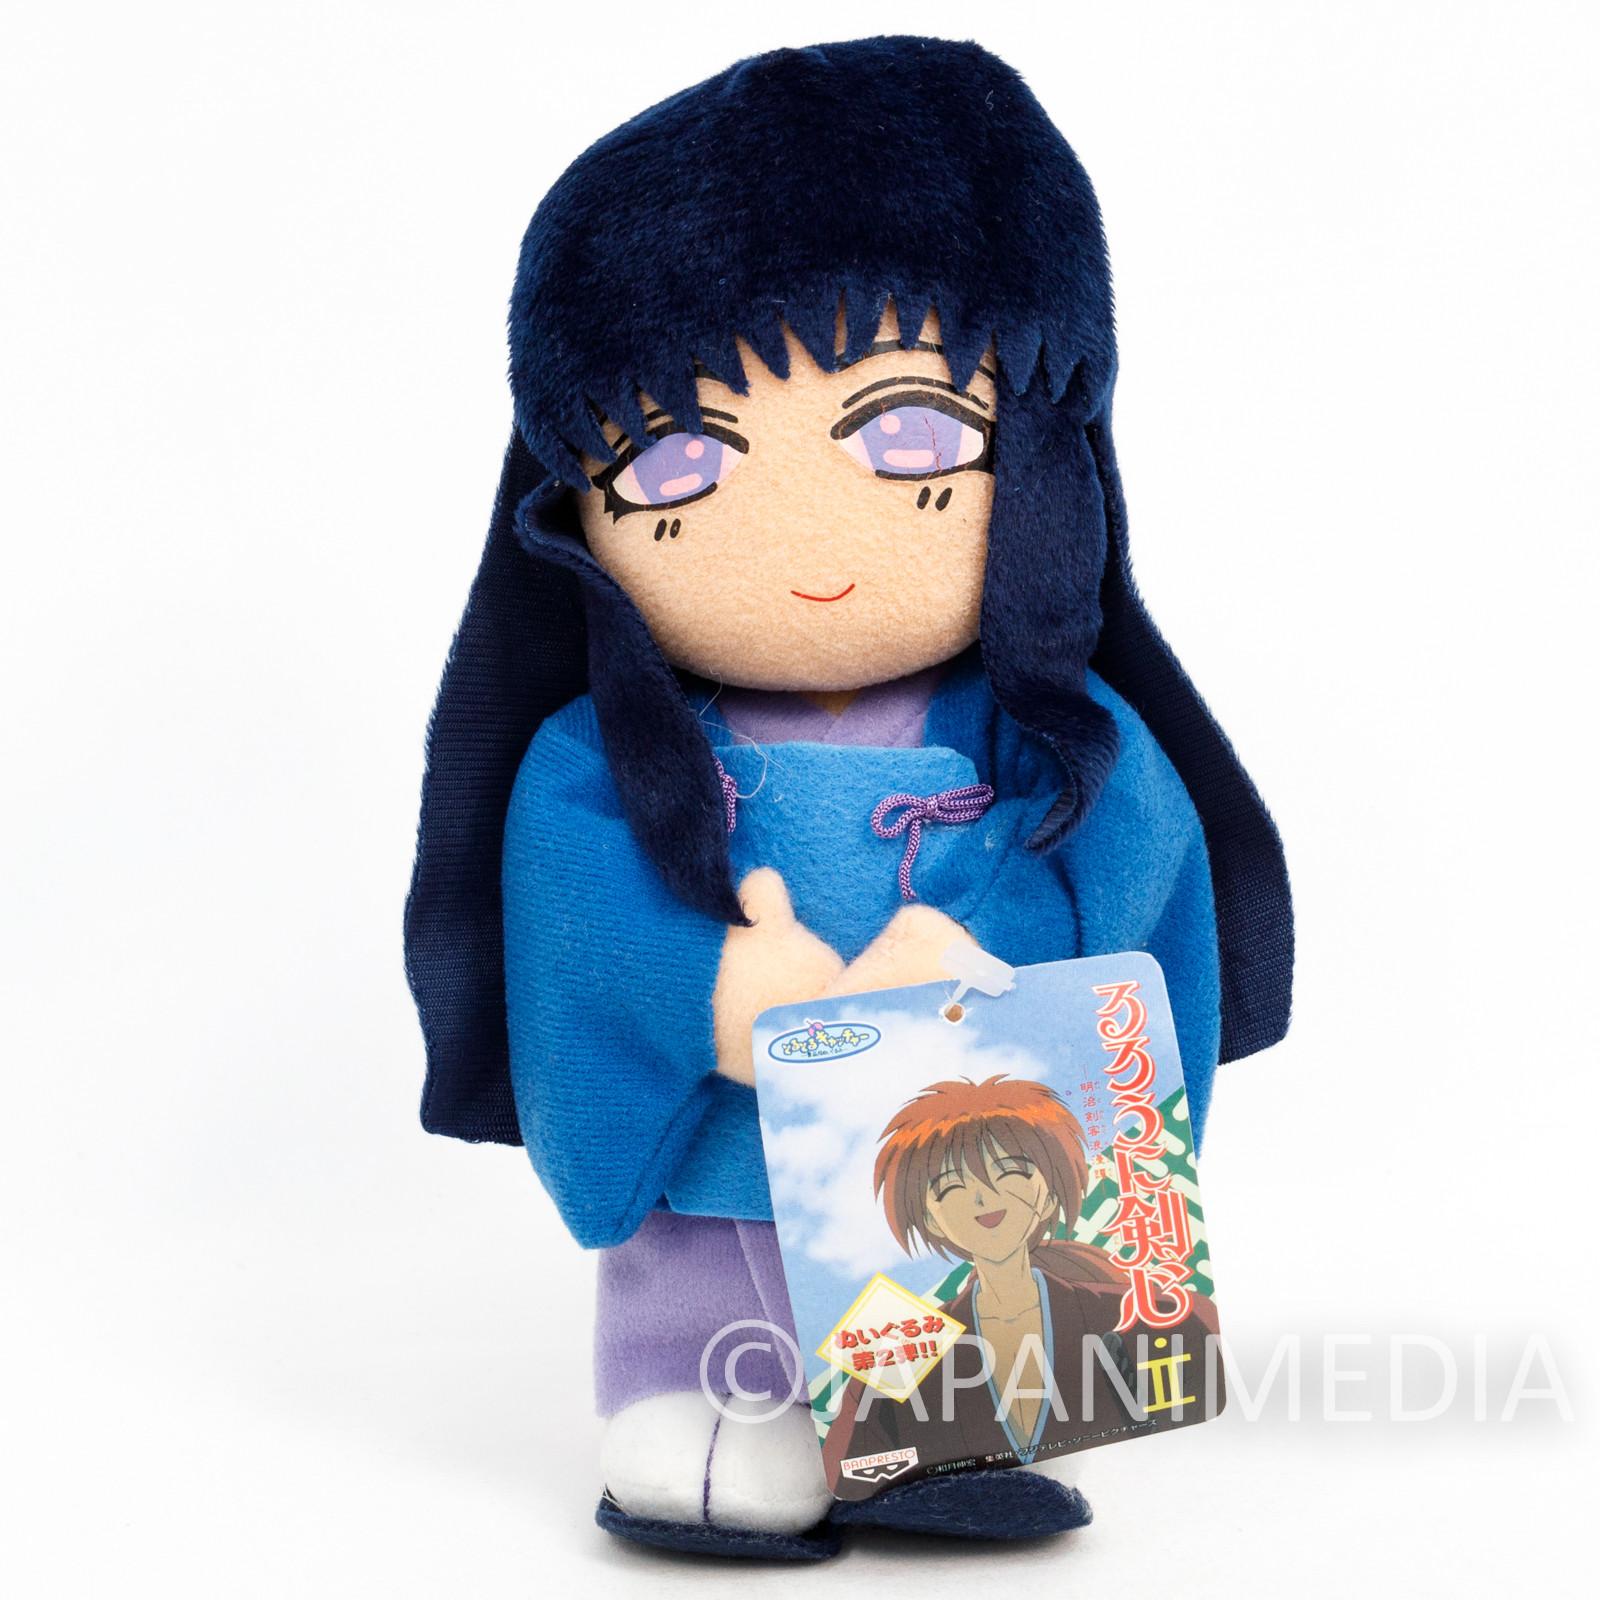 Rurouni Kenshin Megumi Takani Plush Doll JAPAN ANIME